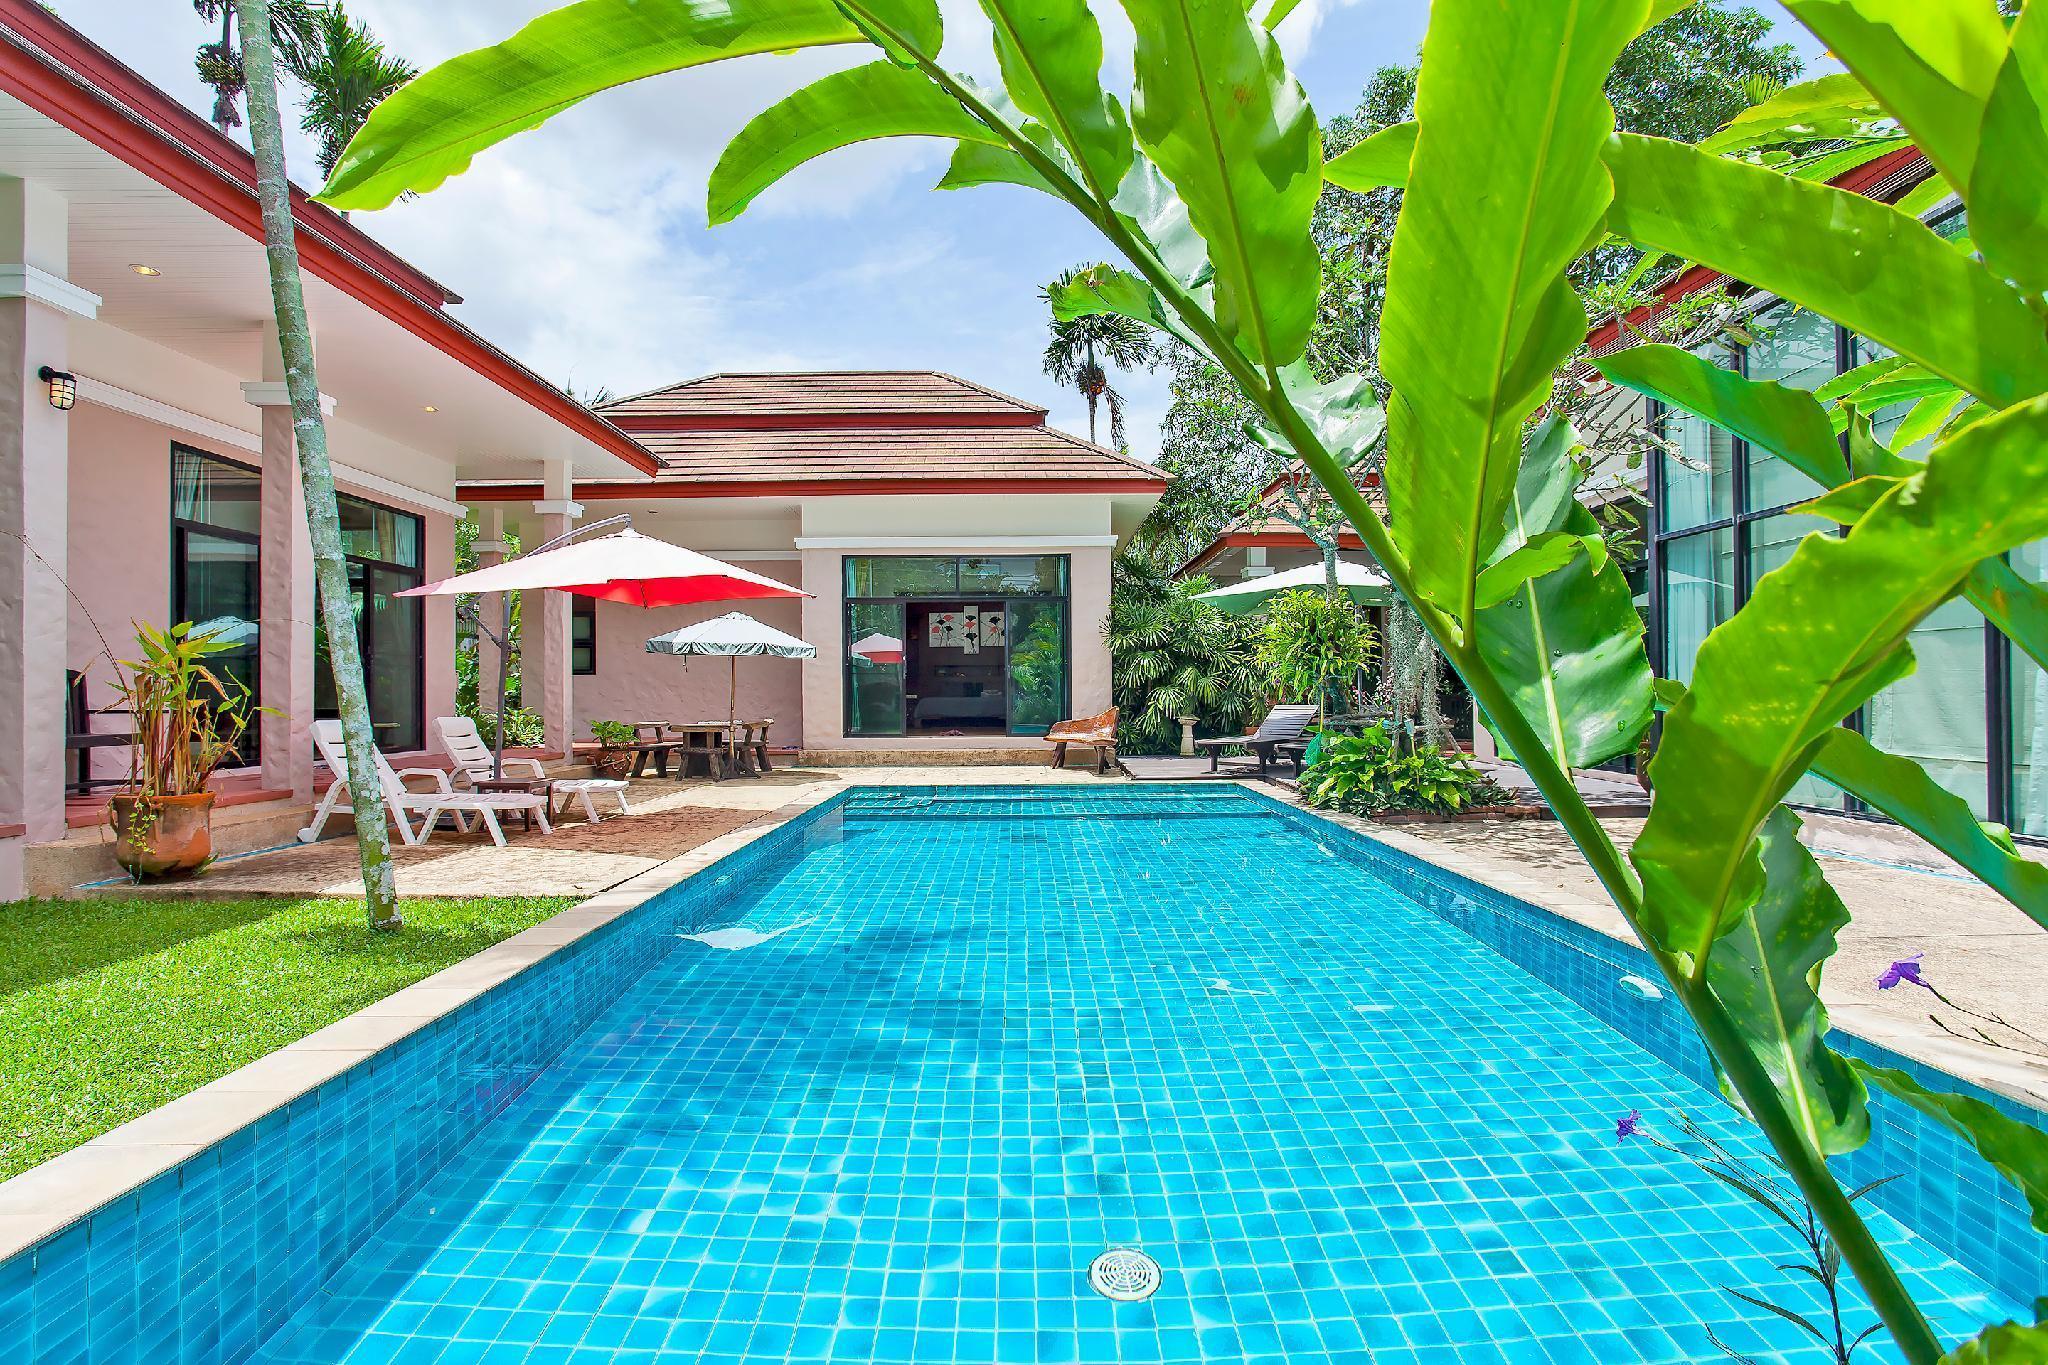 Villa Klasse | Large 3 Bedroom Villa with free car วิลลา 3 ห้องนอน 3 ห้องน้ำส่วนตัว ขนาด 131 ตร.ม. – เขาตาโล